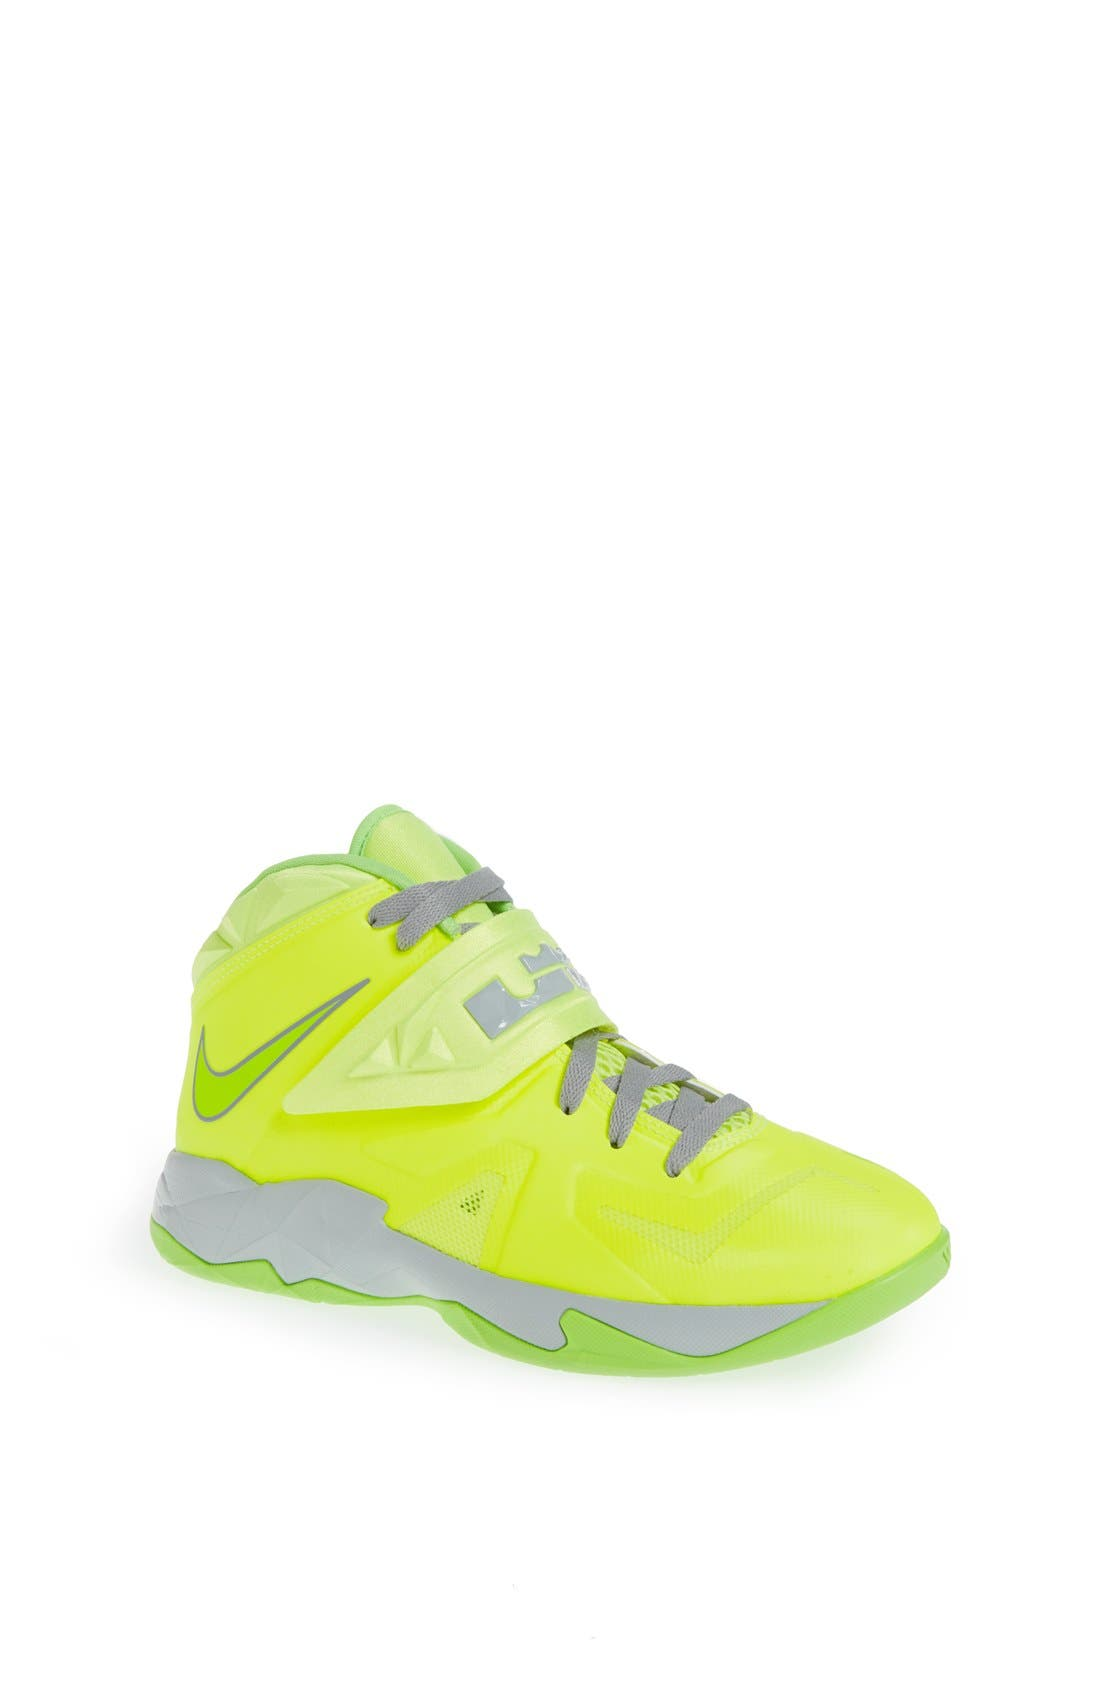 Alternate Image 1 Selected - Nike 'LeBron Zoom Soldier VII' Basketball Shoe (Big Kid)